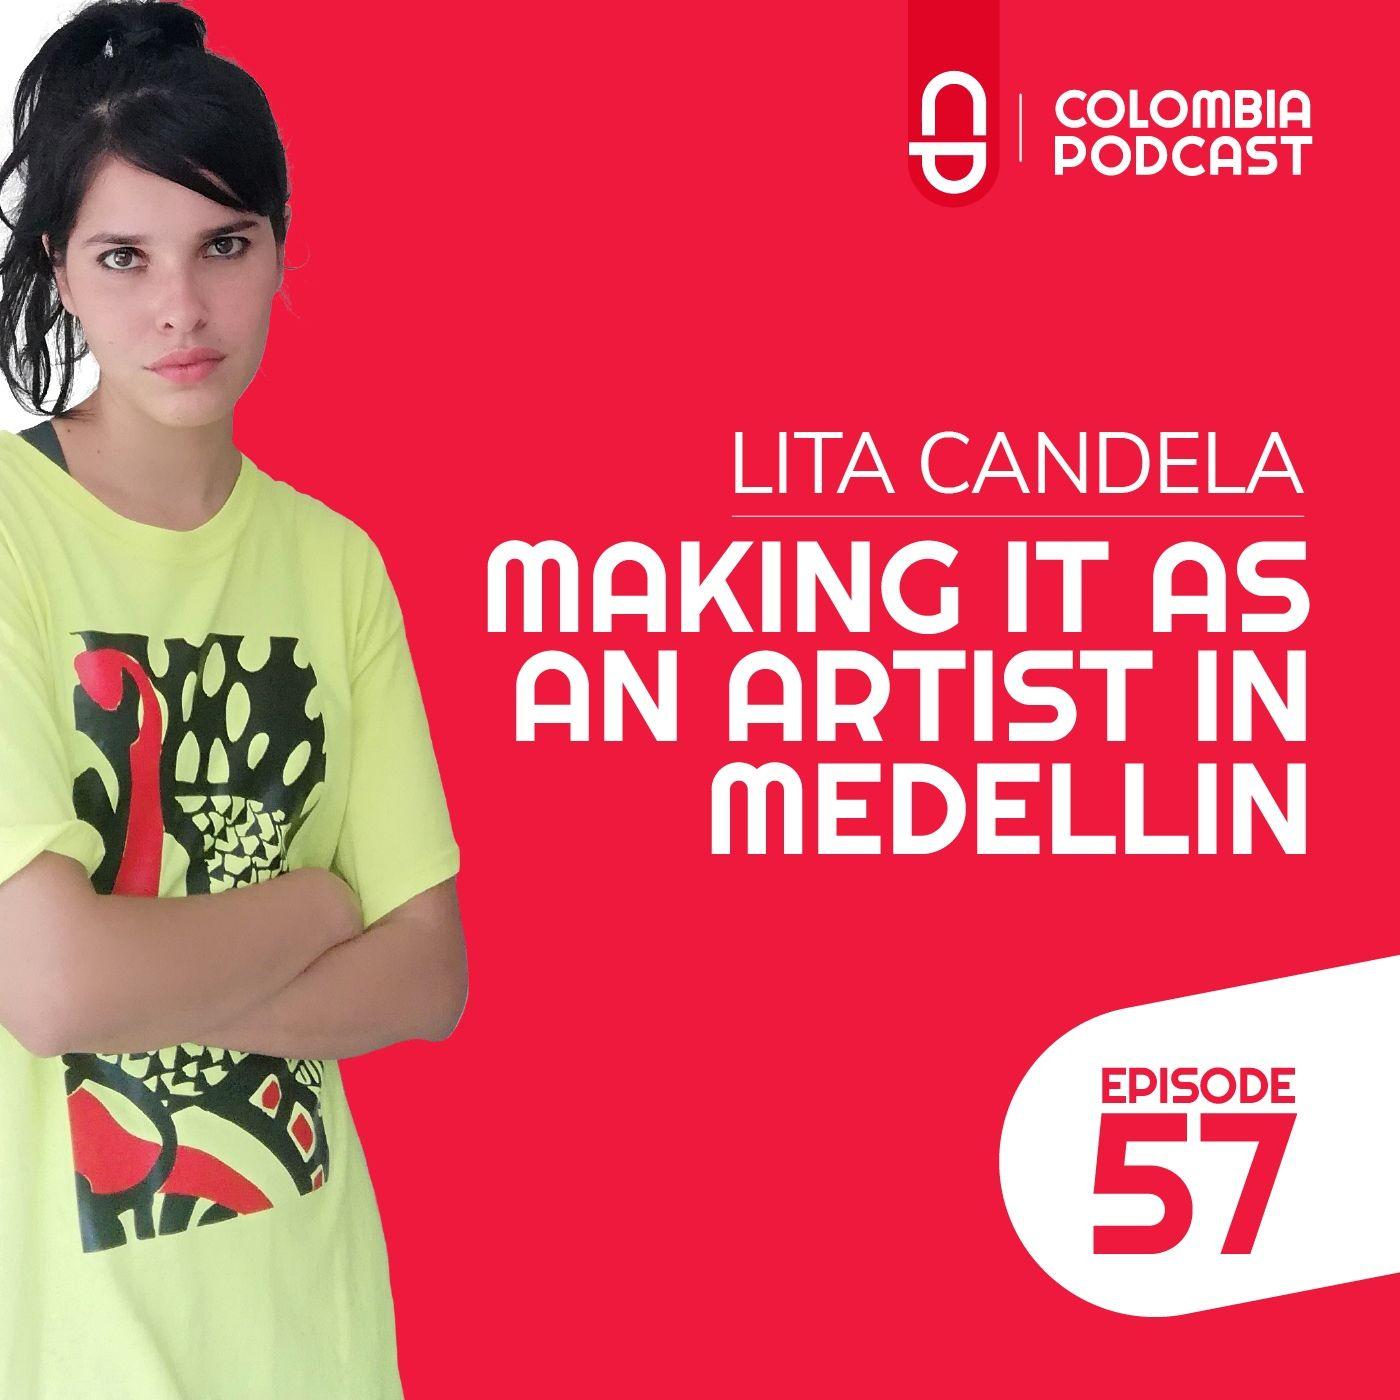 Making it as an Artist in Medellin - Lita Candela's Story (EP 57)